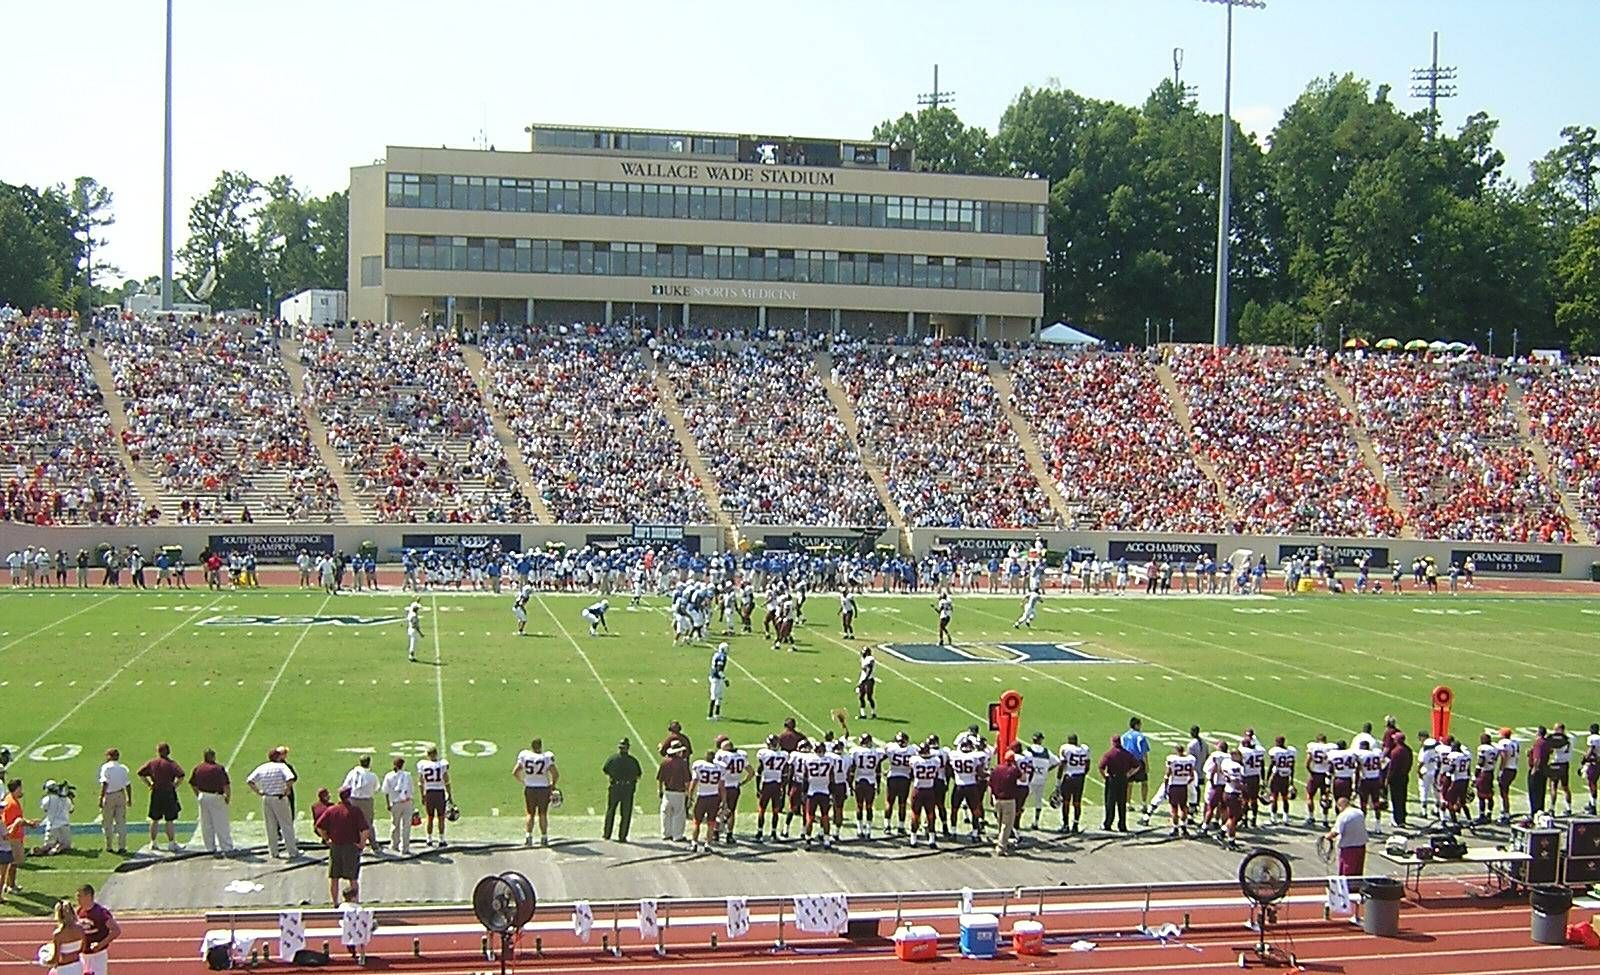 Duke university blue devils inside wallace wade stadium